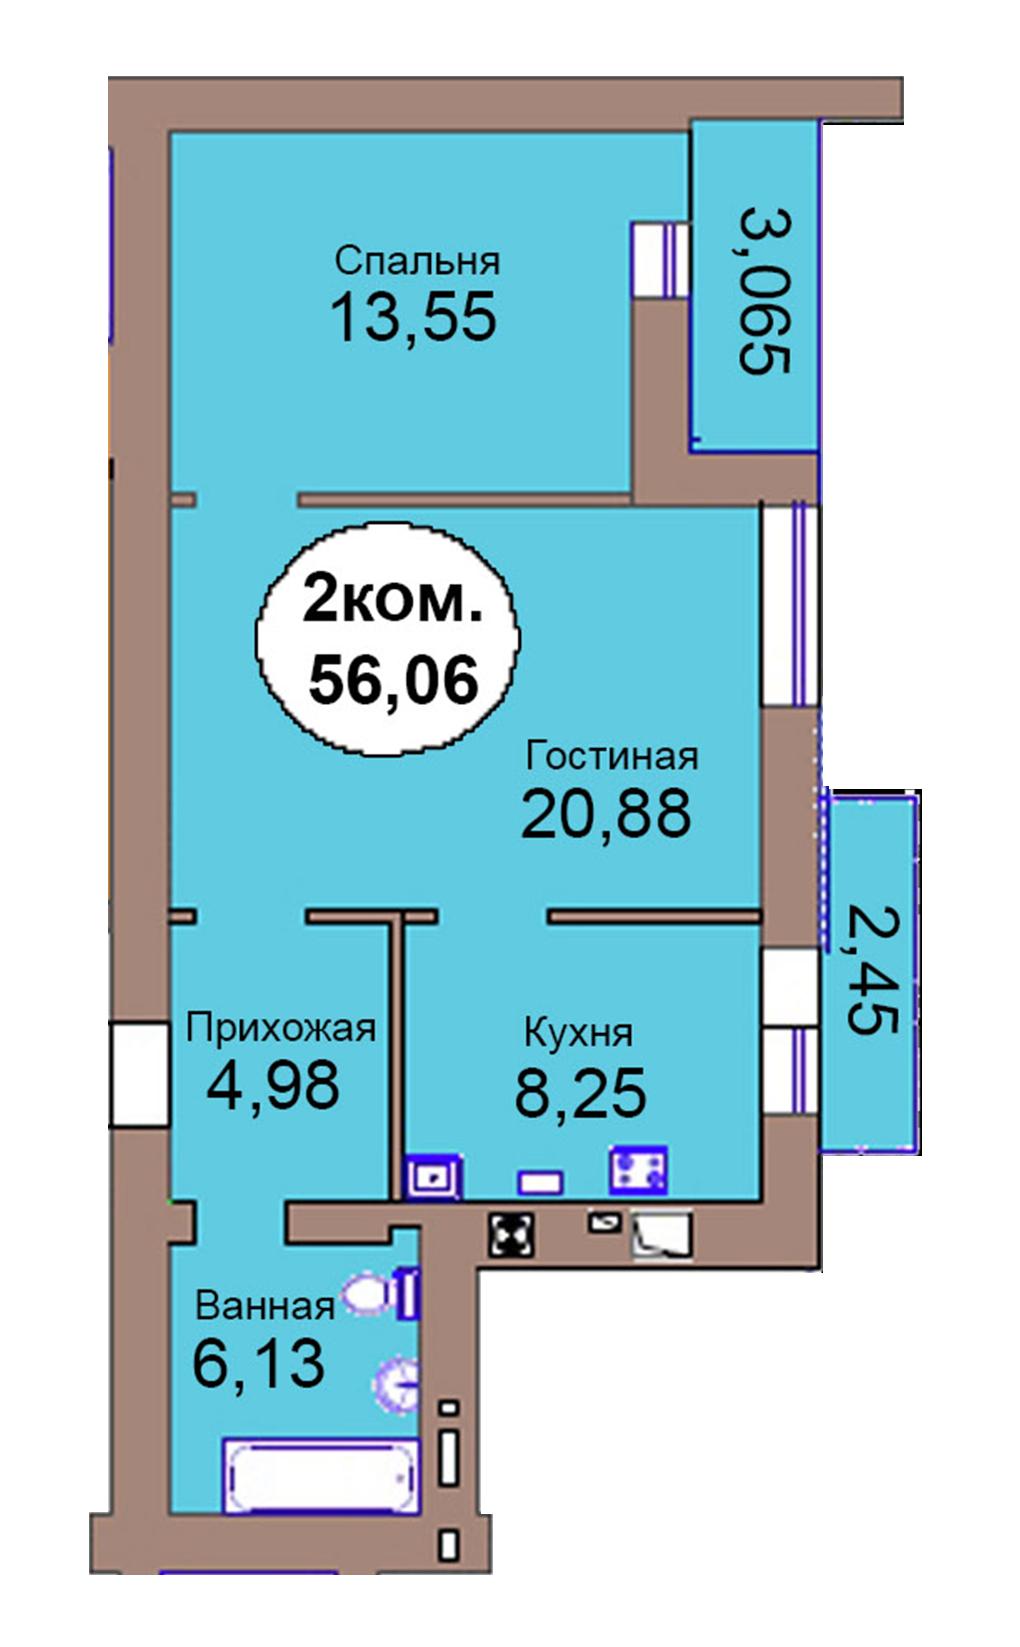 2-комн. кв. по пер. Калининградский, 4  кв. 120 в Калининграде